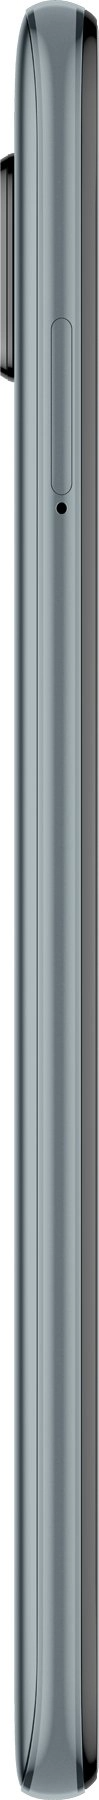 Xiaomi Redmi Note 9S 6GB/128GB 866333052375001 - 4